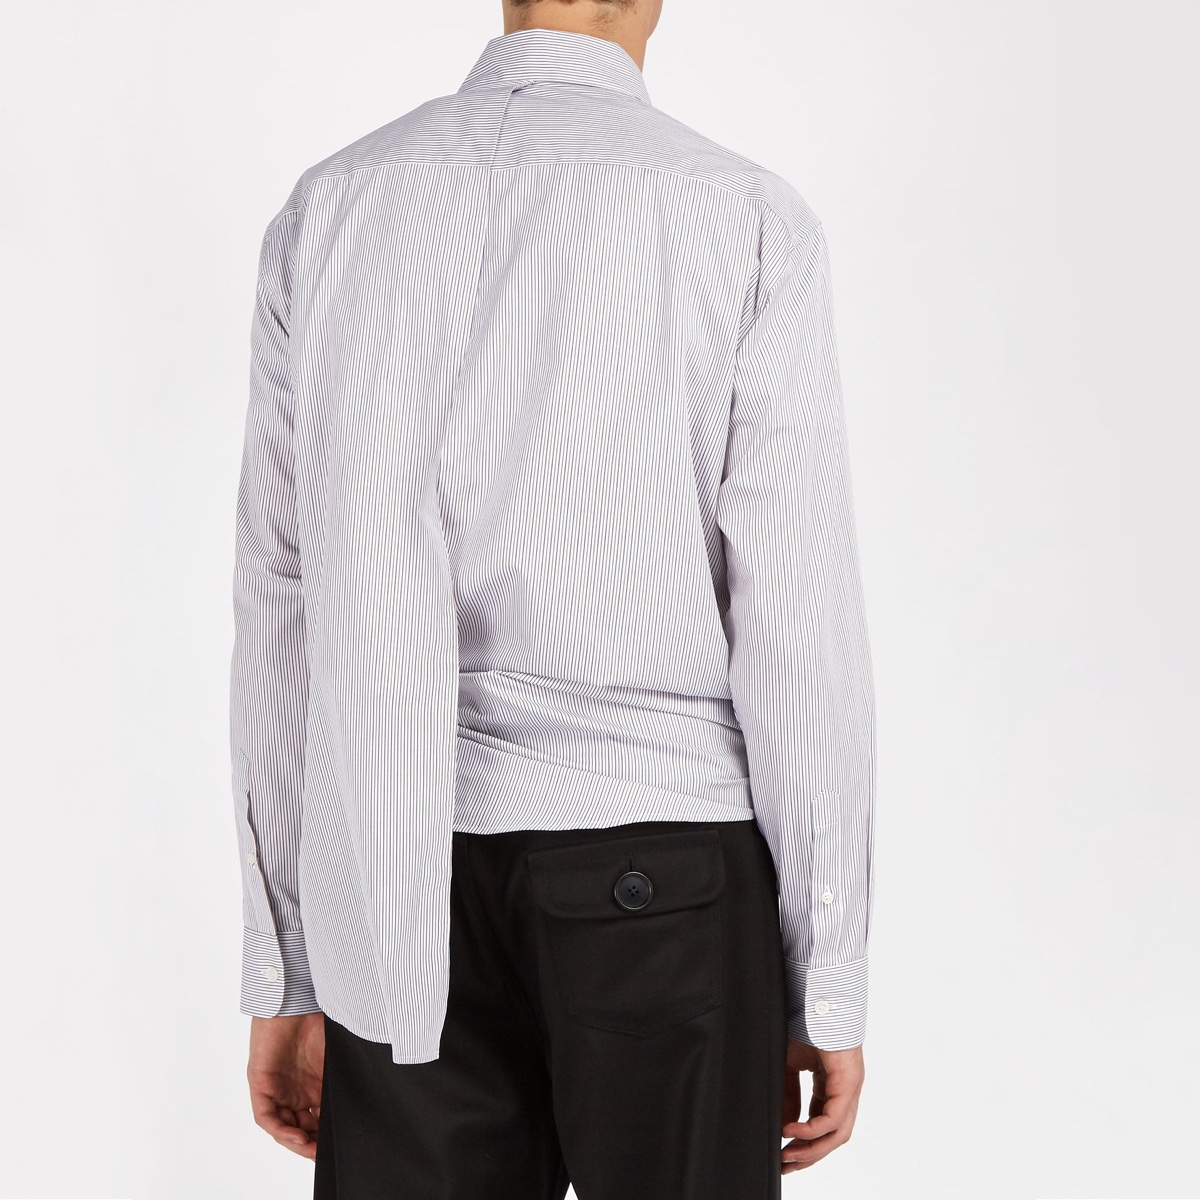 Martine Rose Wrap Shirt f3.jpg